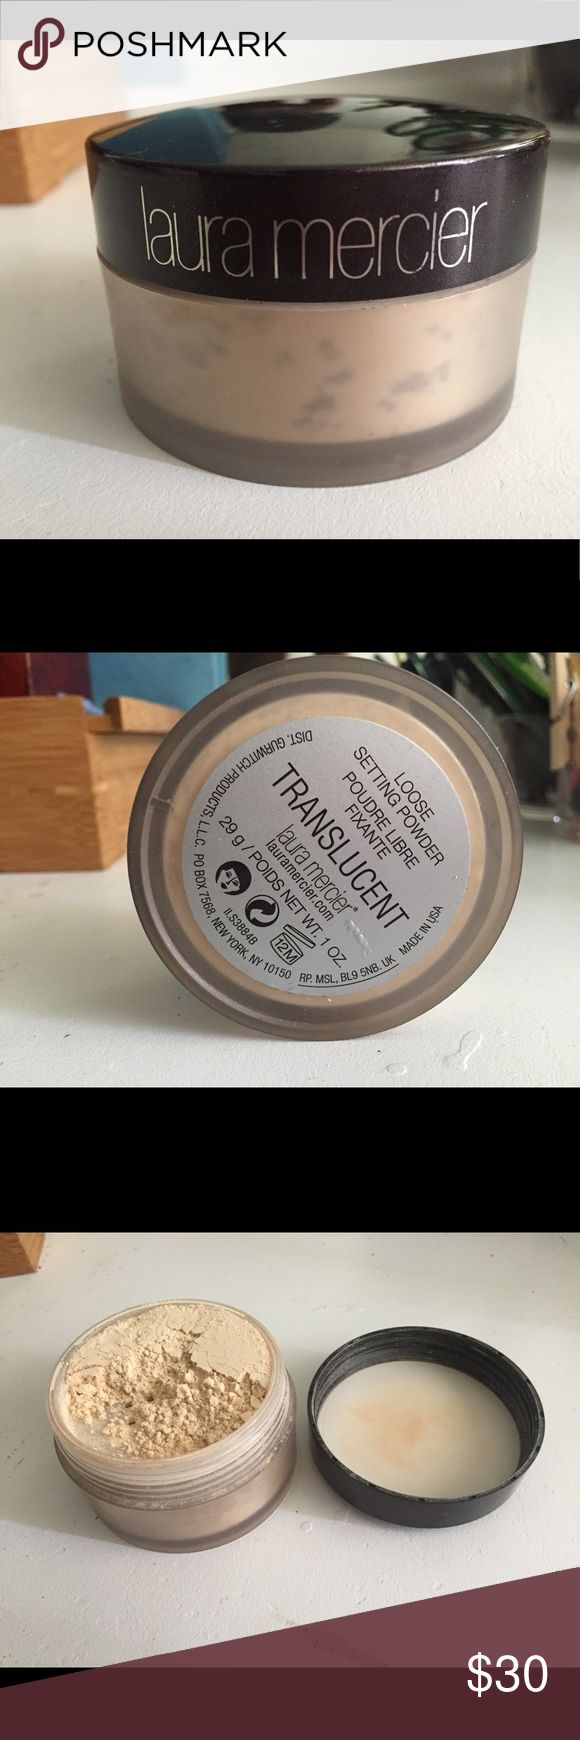 NWOT💋Laura Mercier Translucent Setting Powder NWOT Laura